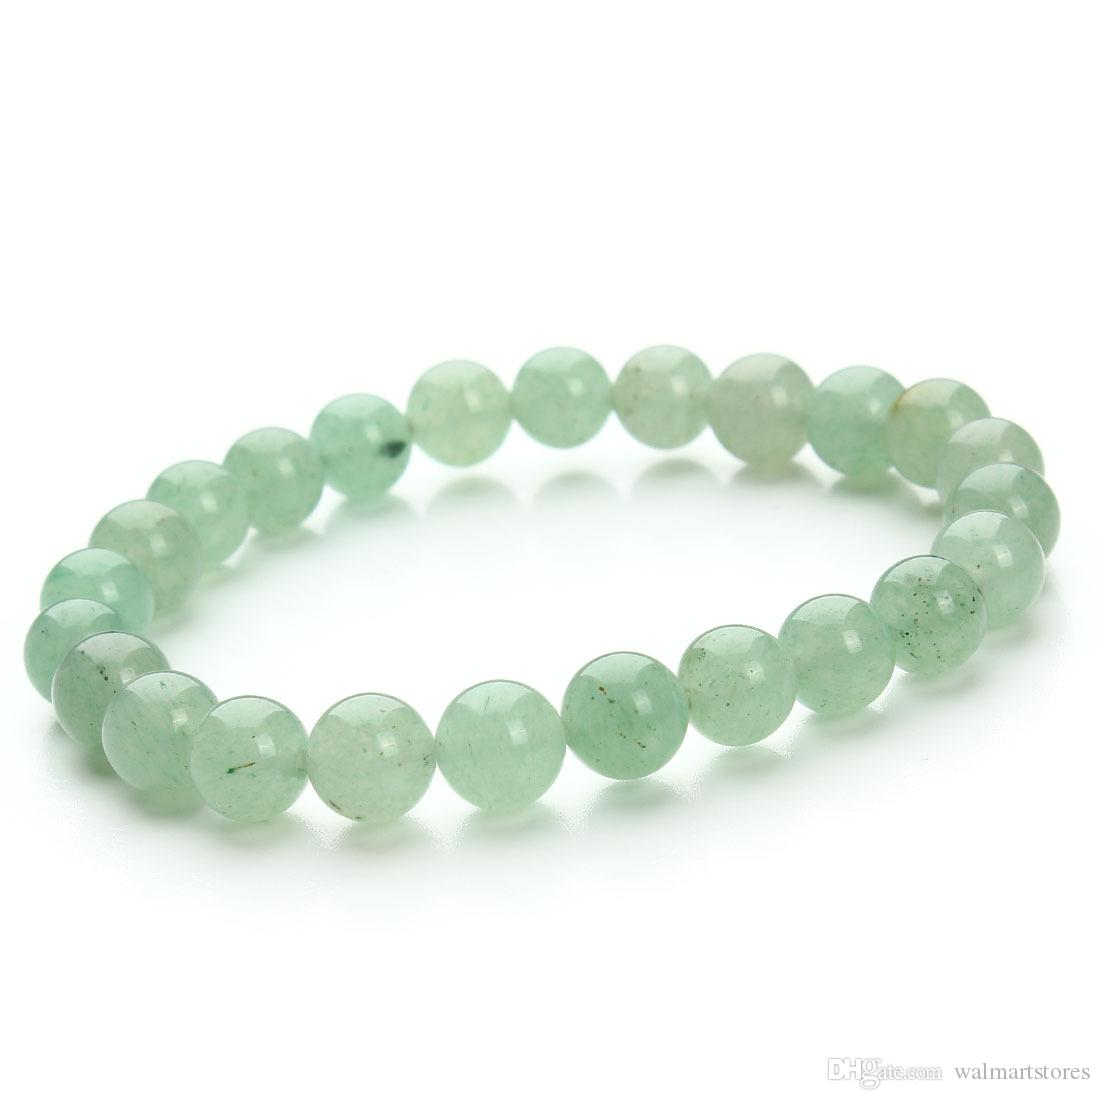 Find Something Different New Jade Gemstone Power Bracelet 24 Beads 8mm VwkE9F